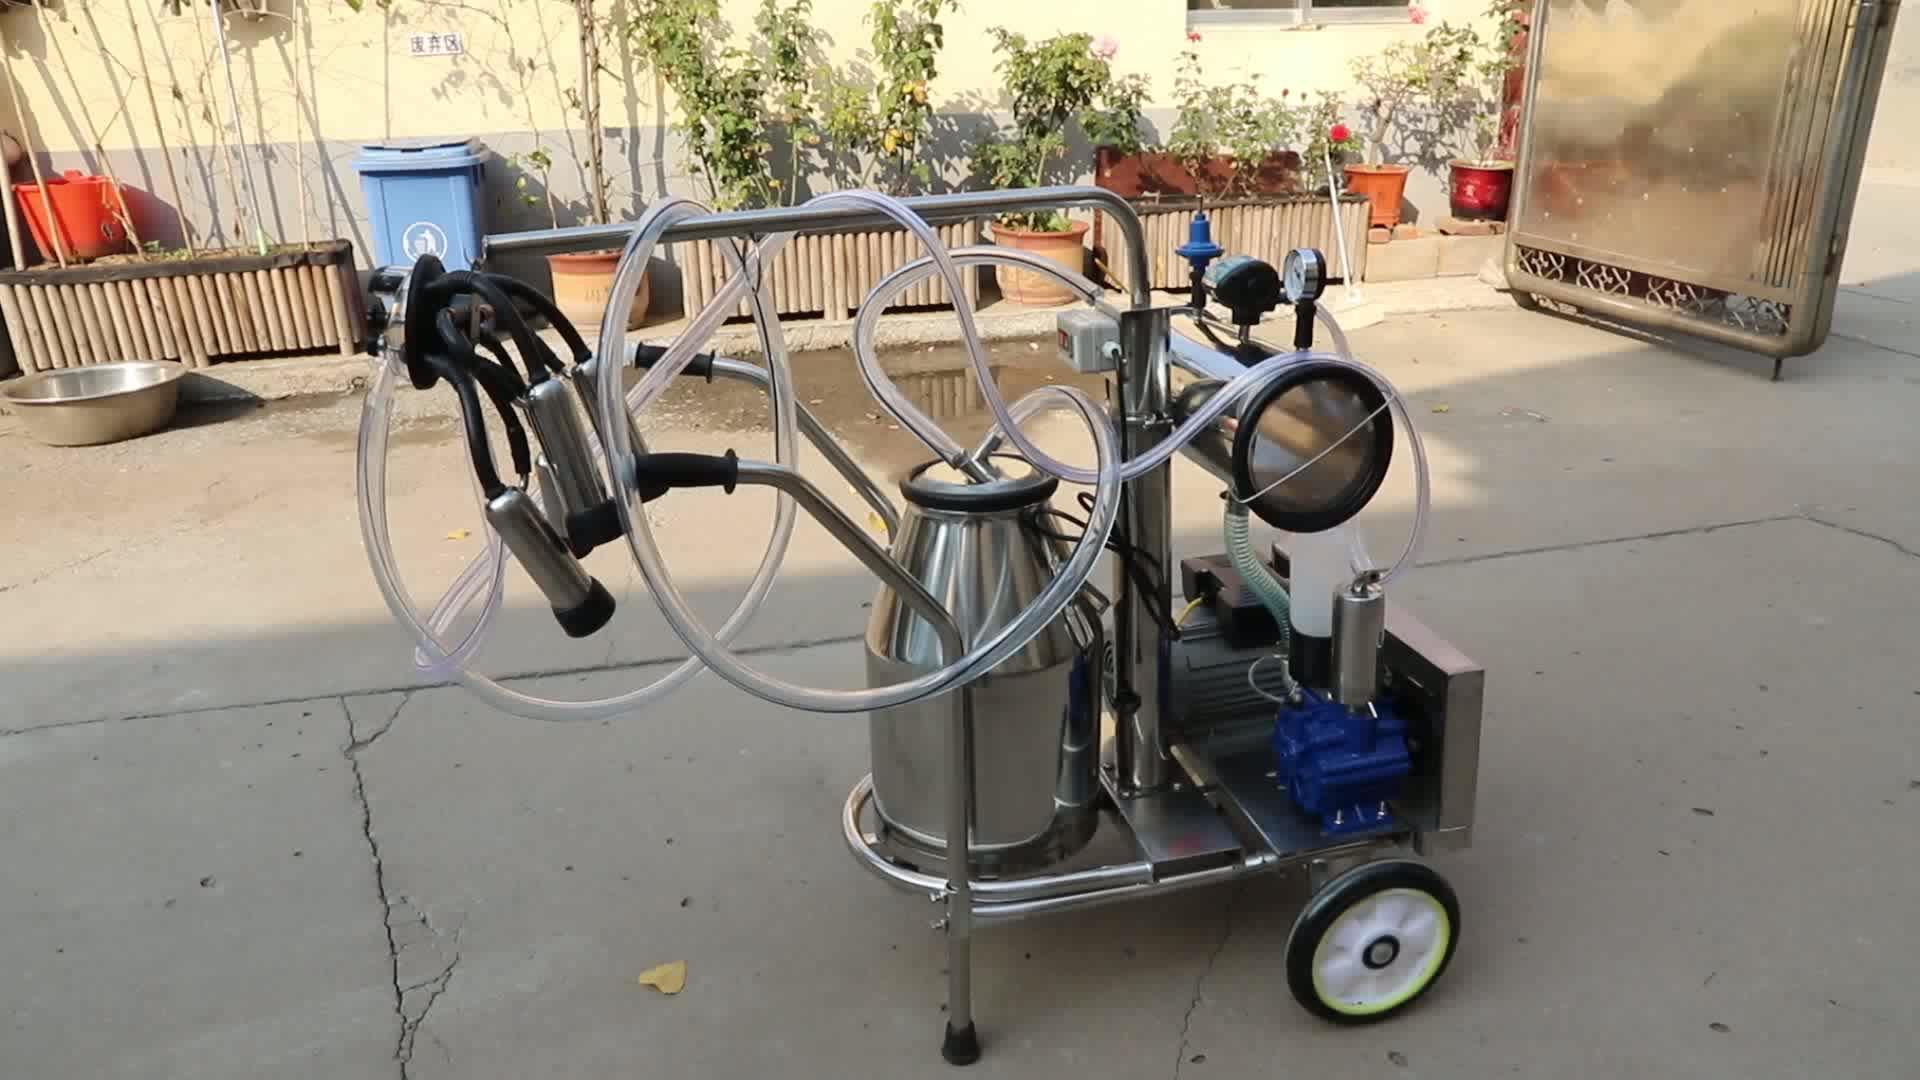 YZ-1 उच्च गुणवत्ता स्टेनलेस स्टील पोर्टेबल गाय दूध देने की मशीन